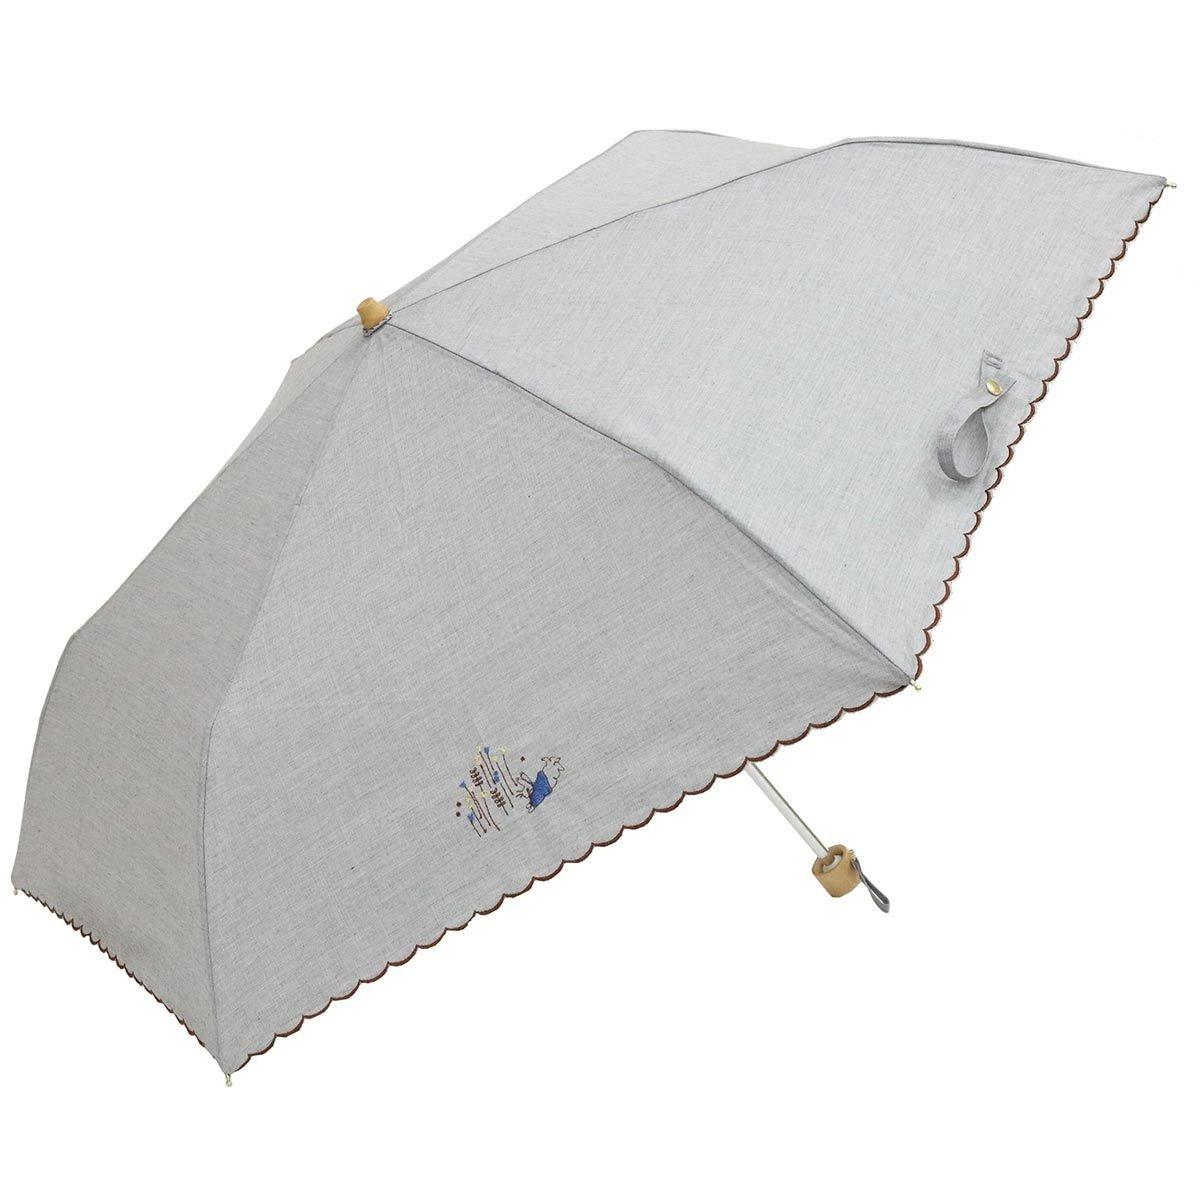 Nifty Colors 折りたたみ傘 グレー 50cm シャンブレー 刺繍 6本骨 UVカット95% 以上 B07CC26219グレー